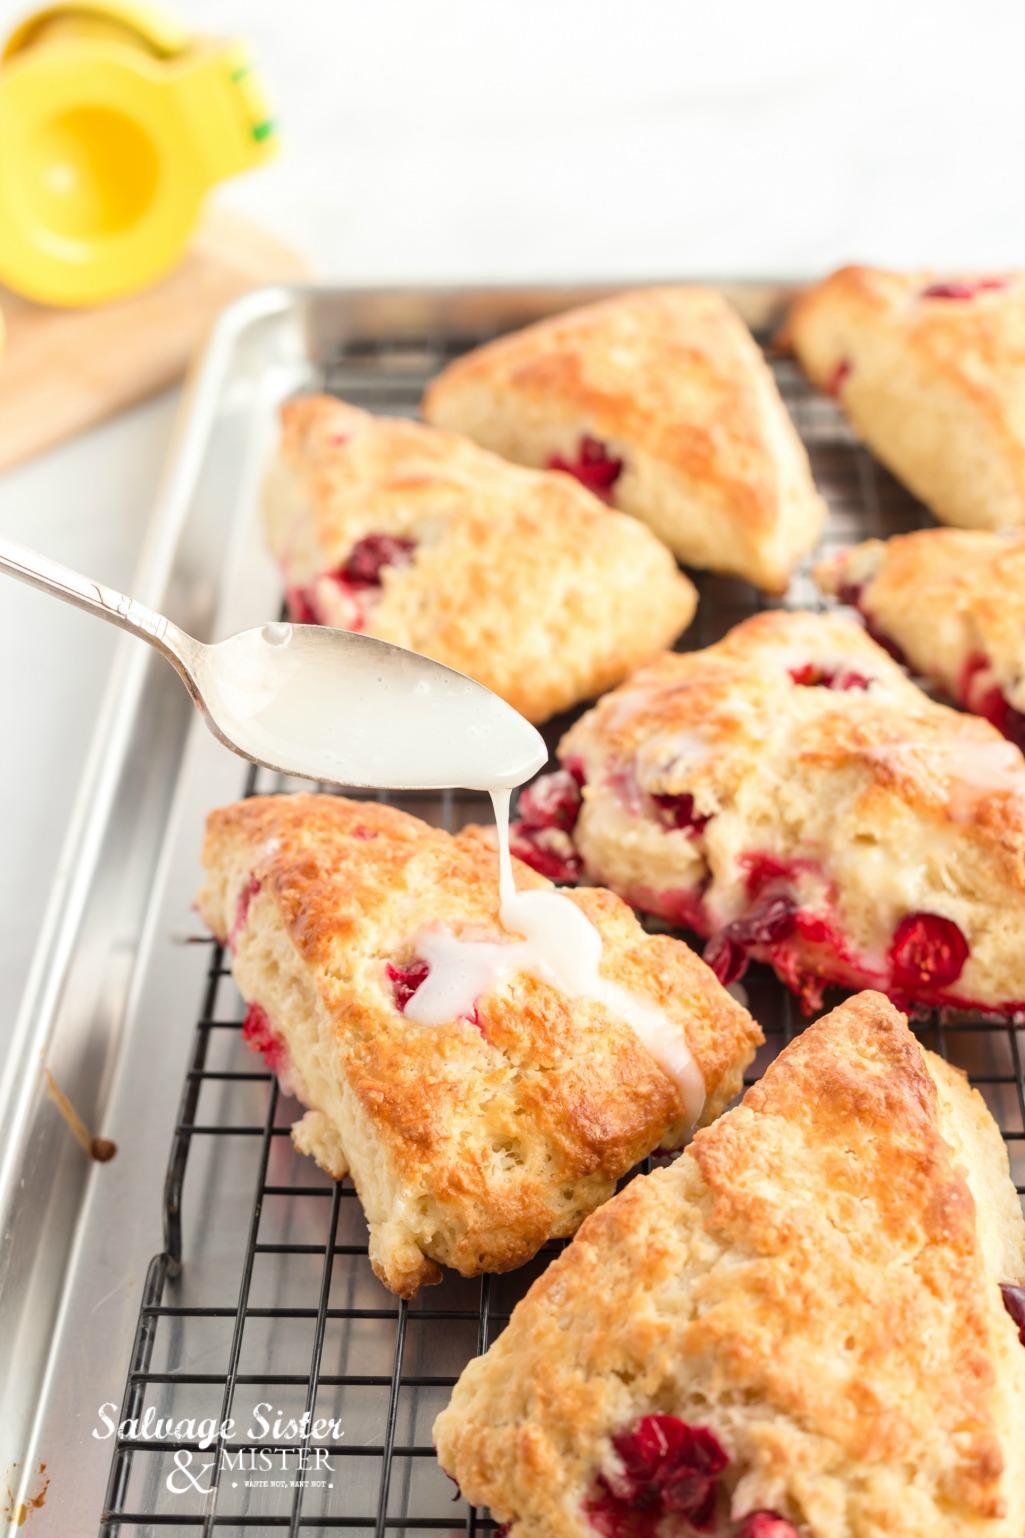 recipe forcranberry lemon scones on salvagesisterandmister.com